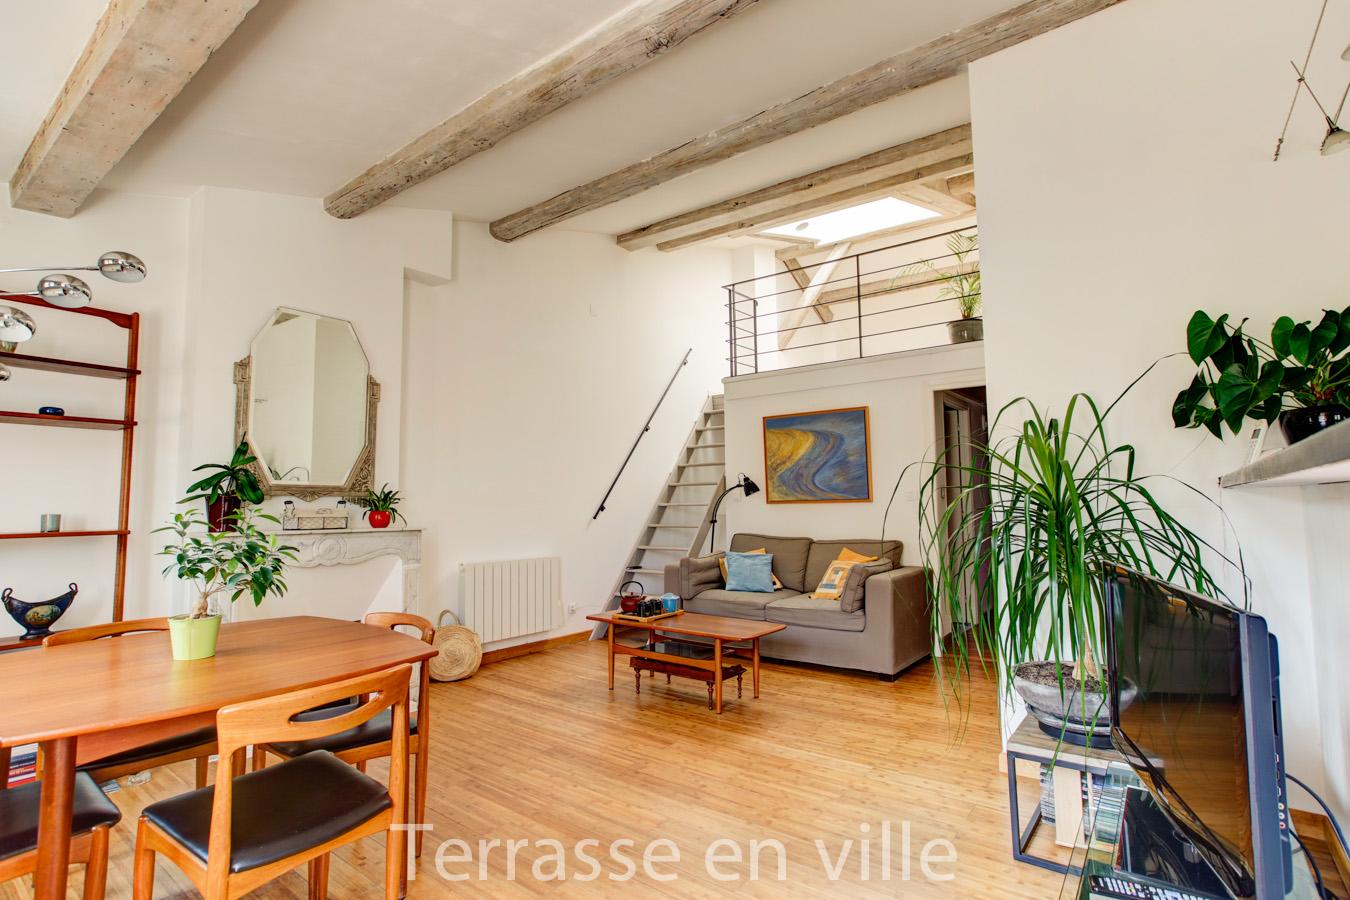 terrasse-6-2.jpg